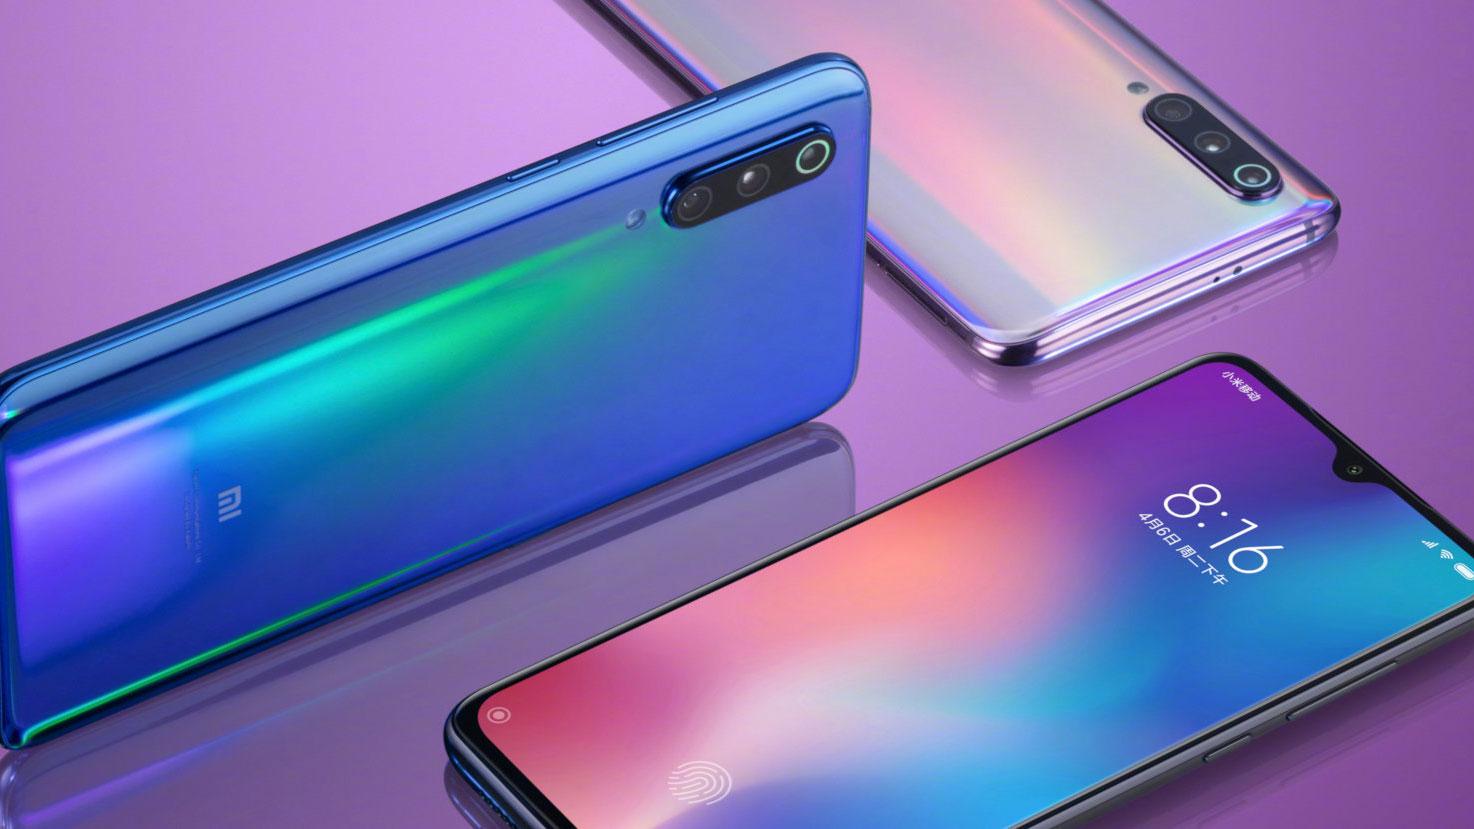 Xiaomi Mi 9 Android 11 update